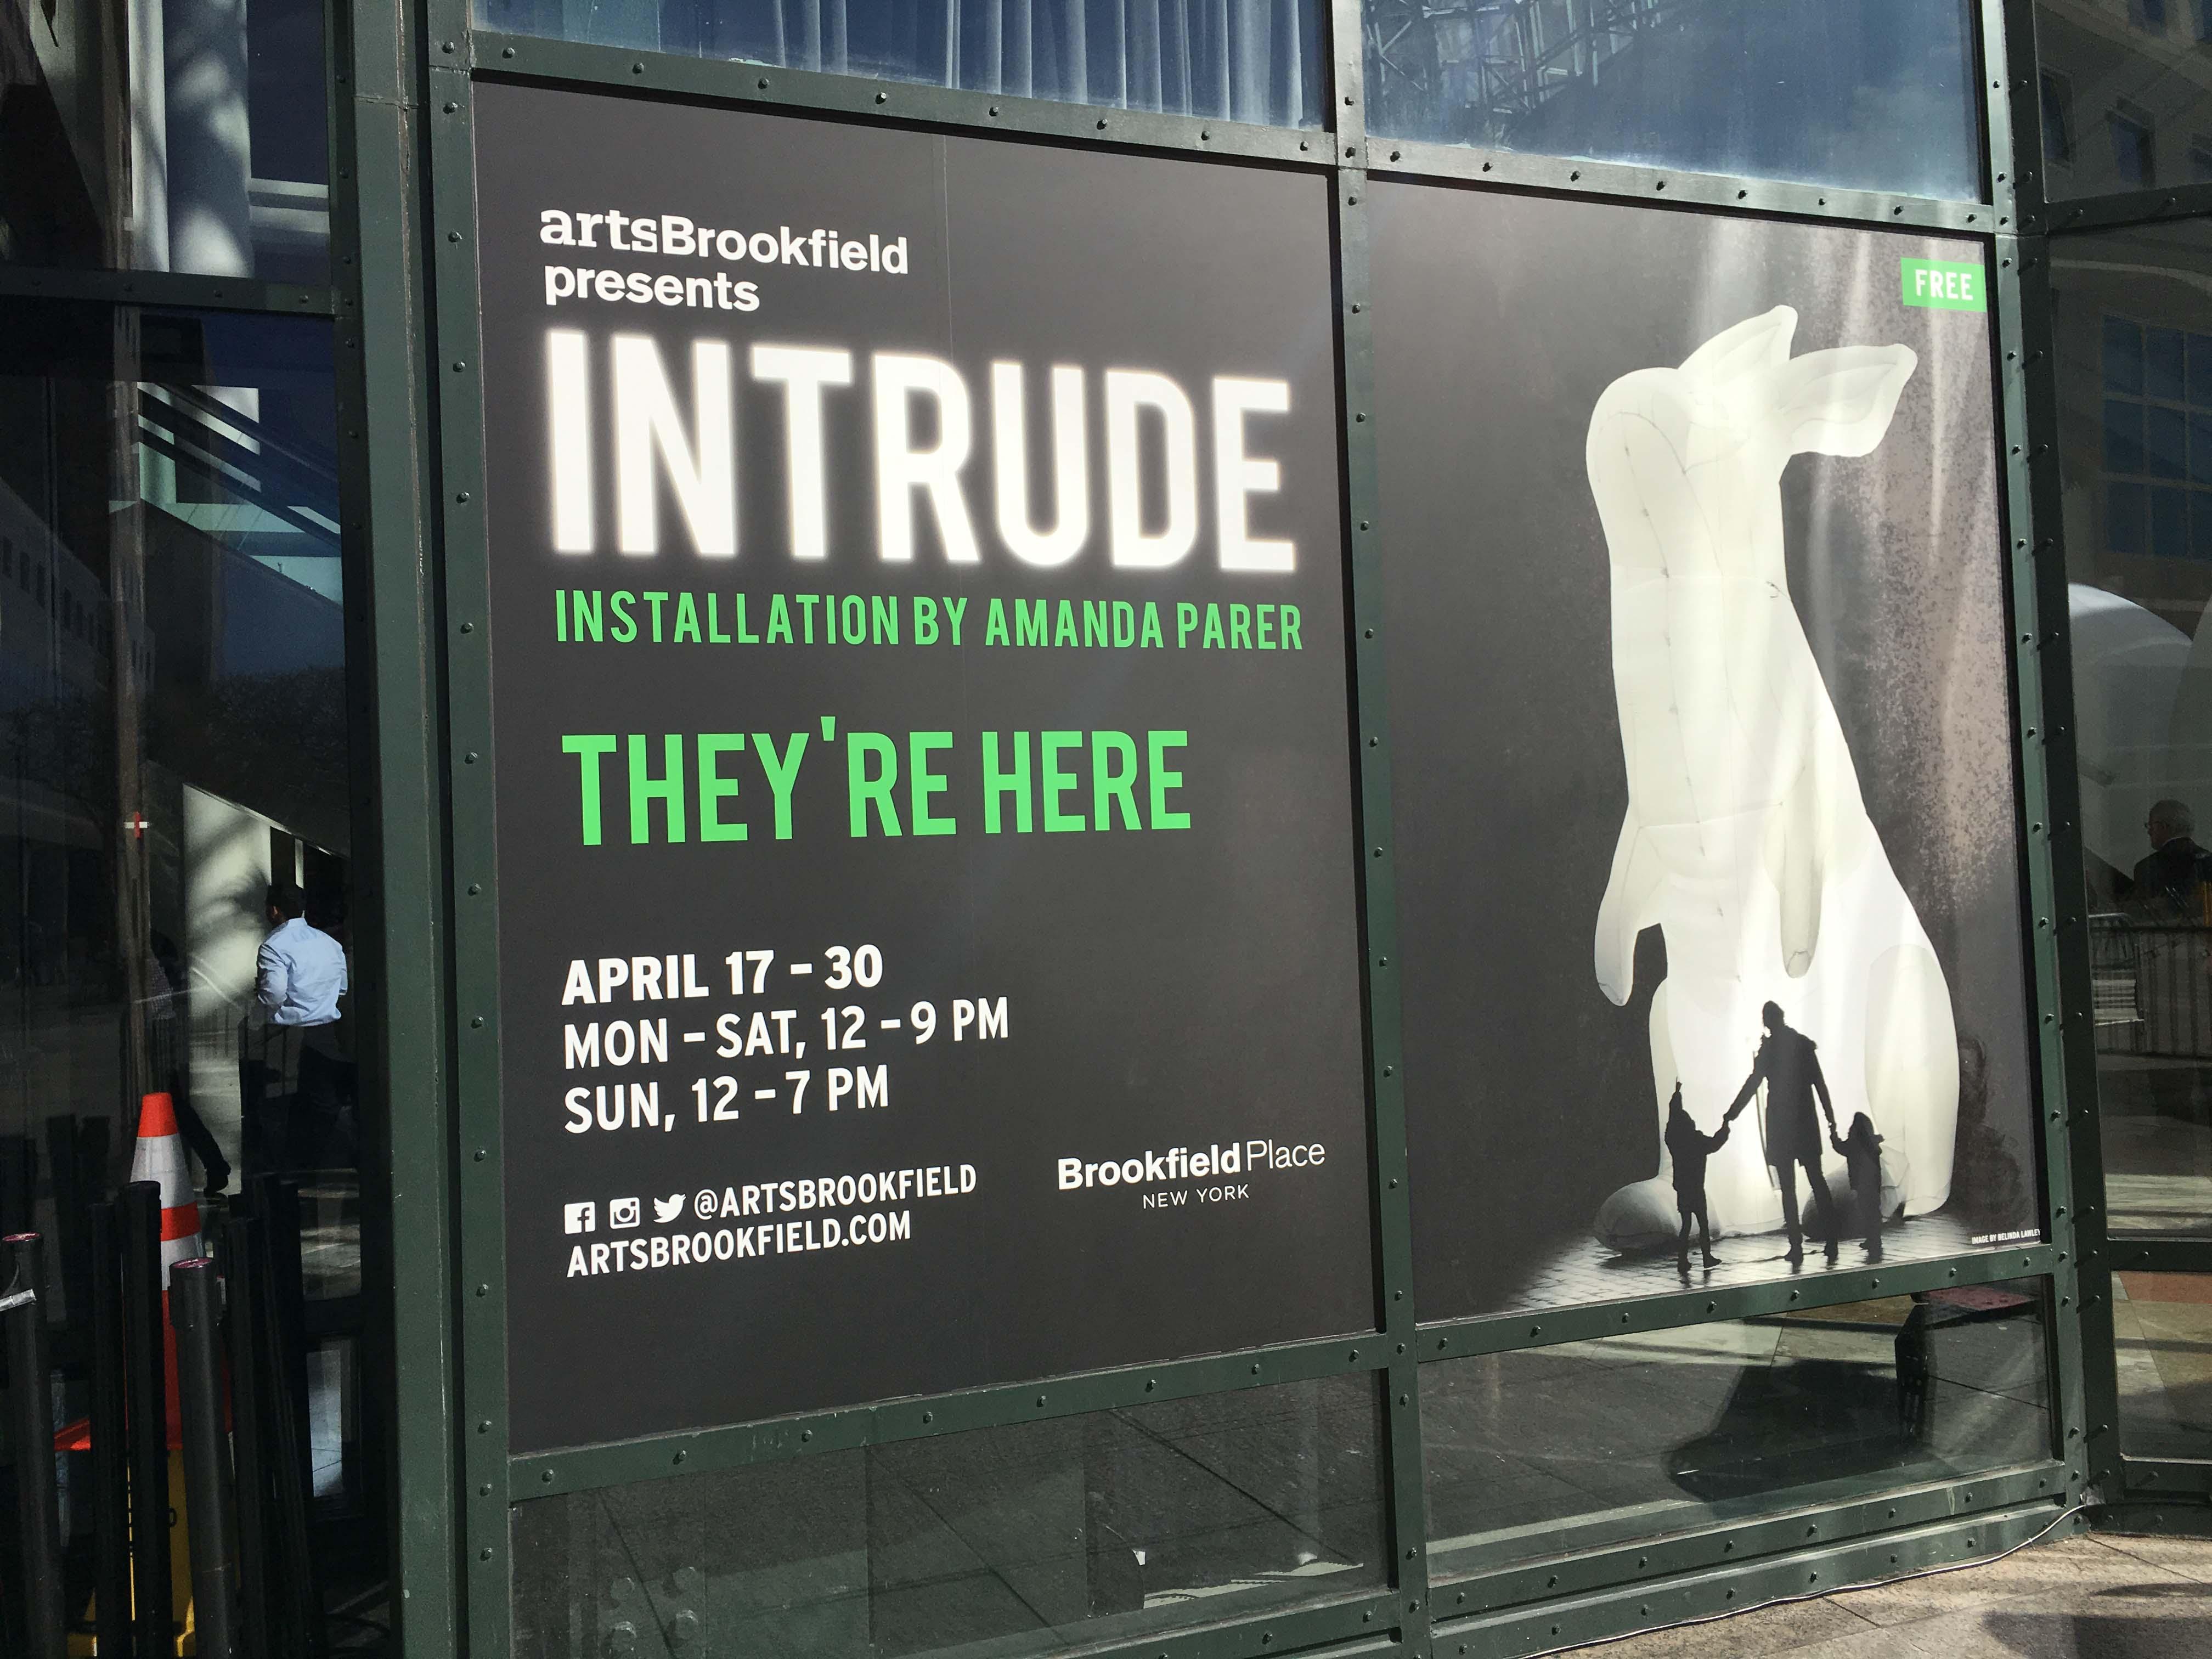 INtrude exhibit